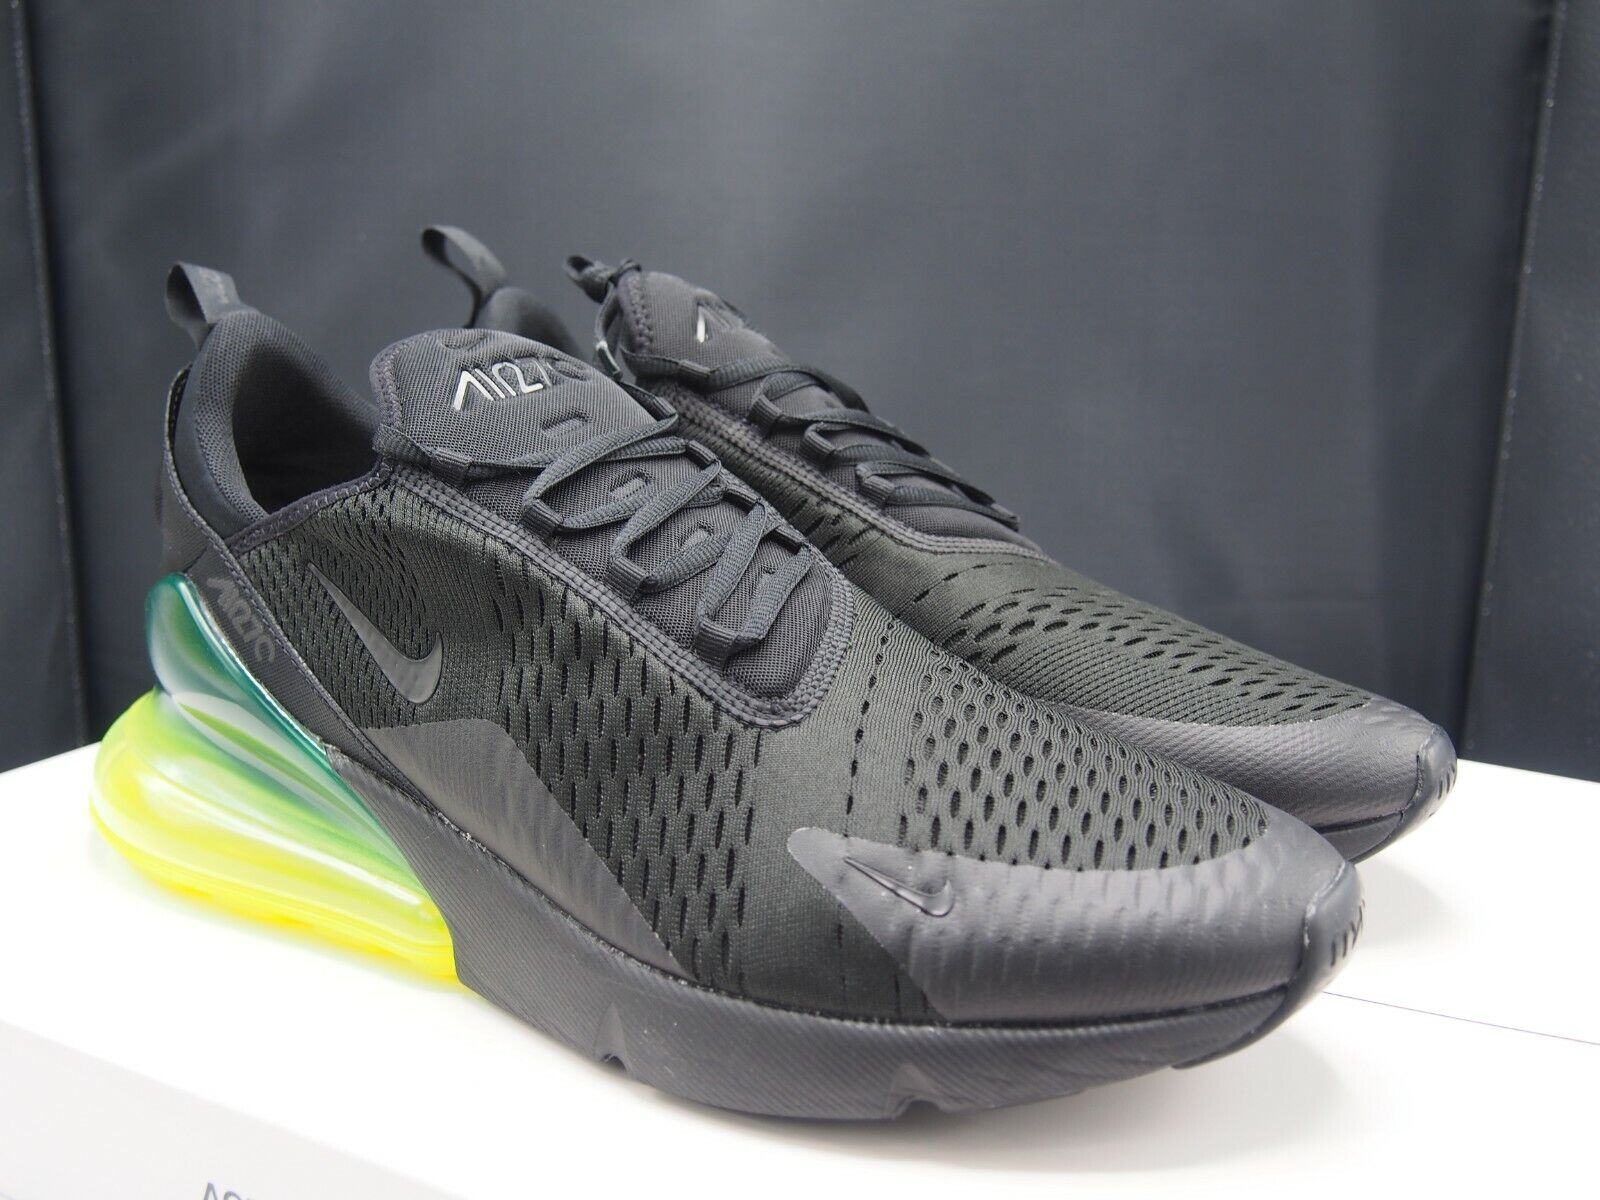 best website 25d83 26b3e Nike Air Max 270 Black Volt Green Men's Size 15 Neon Ah8050-011